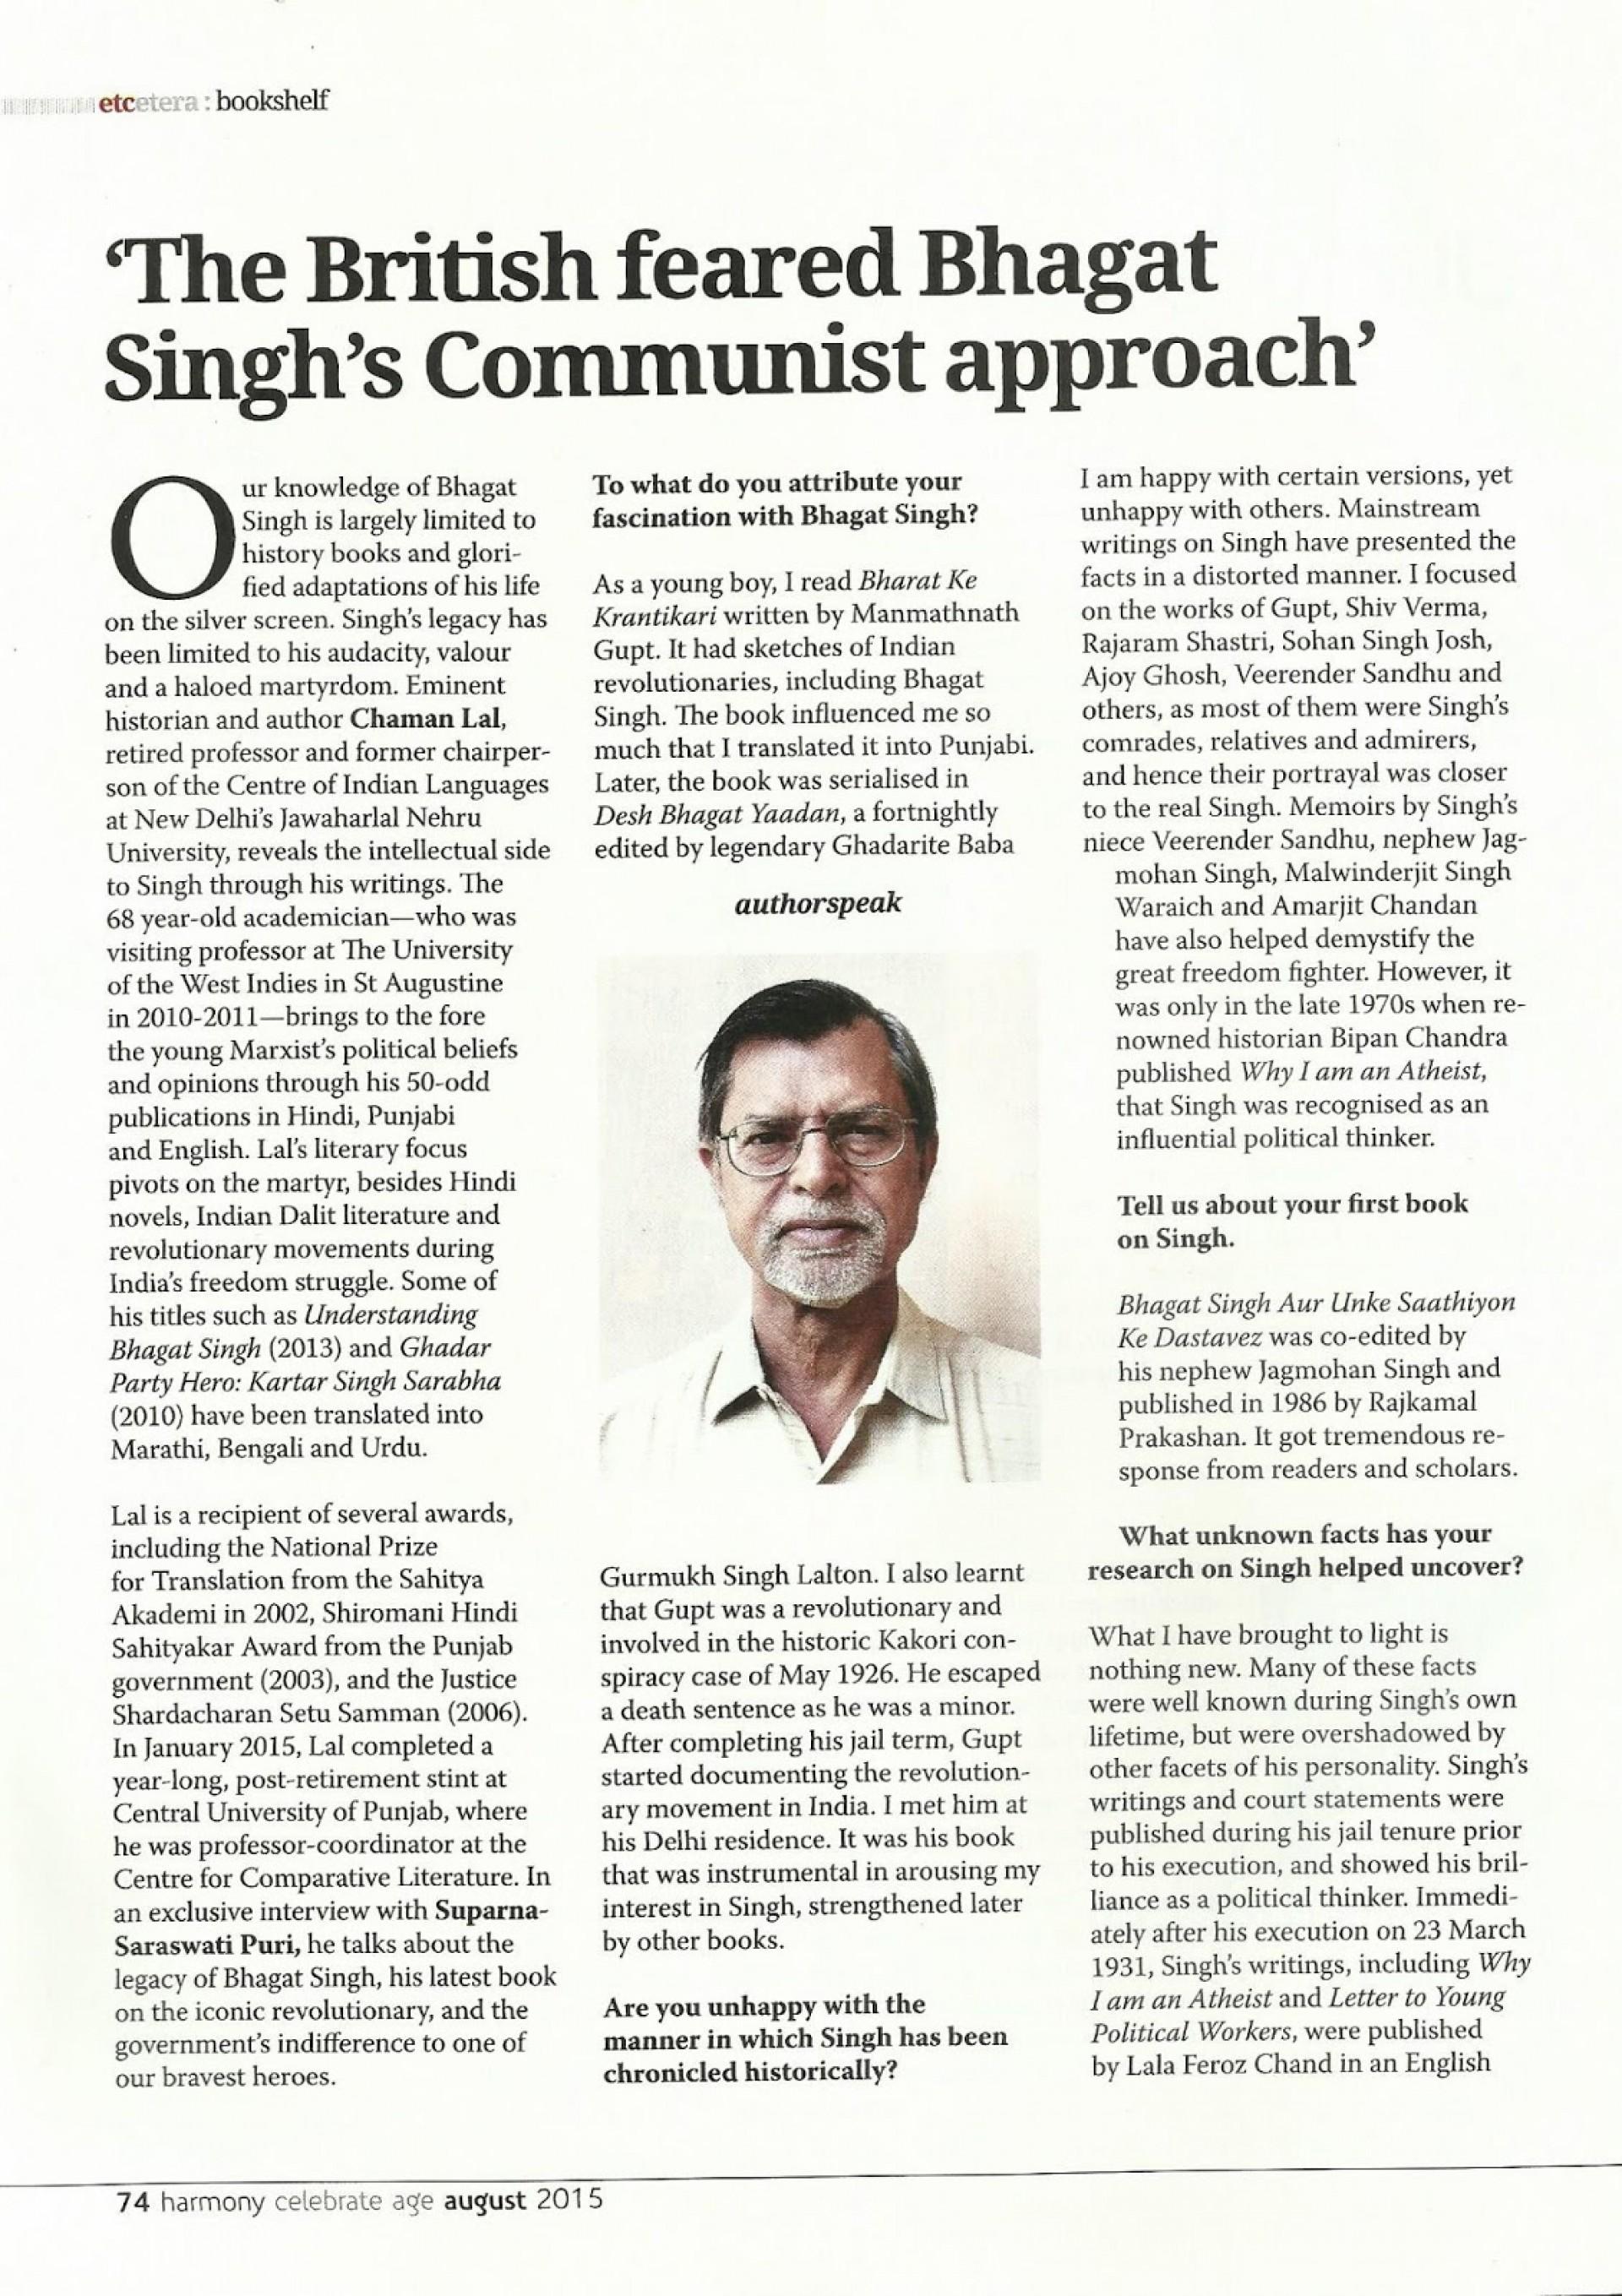 017 Essay On Bhagat Singh In Marathi Example Interview2bon2bbs Harmony Unique Short 100 Words 1920